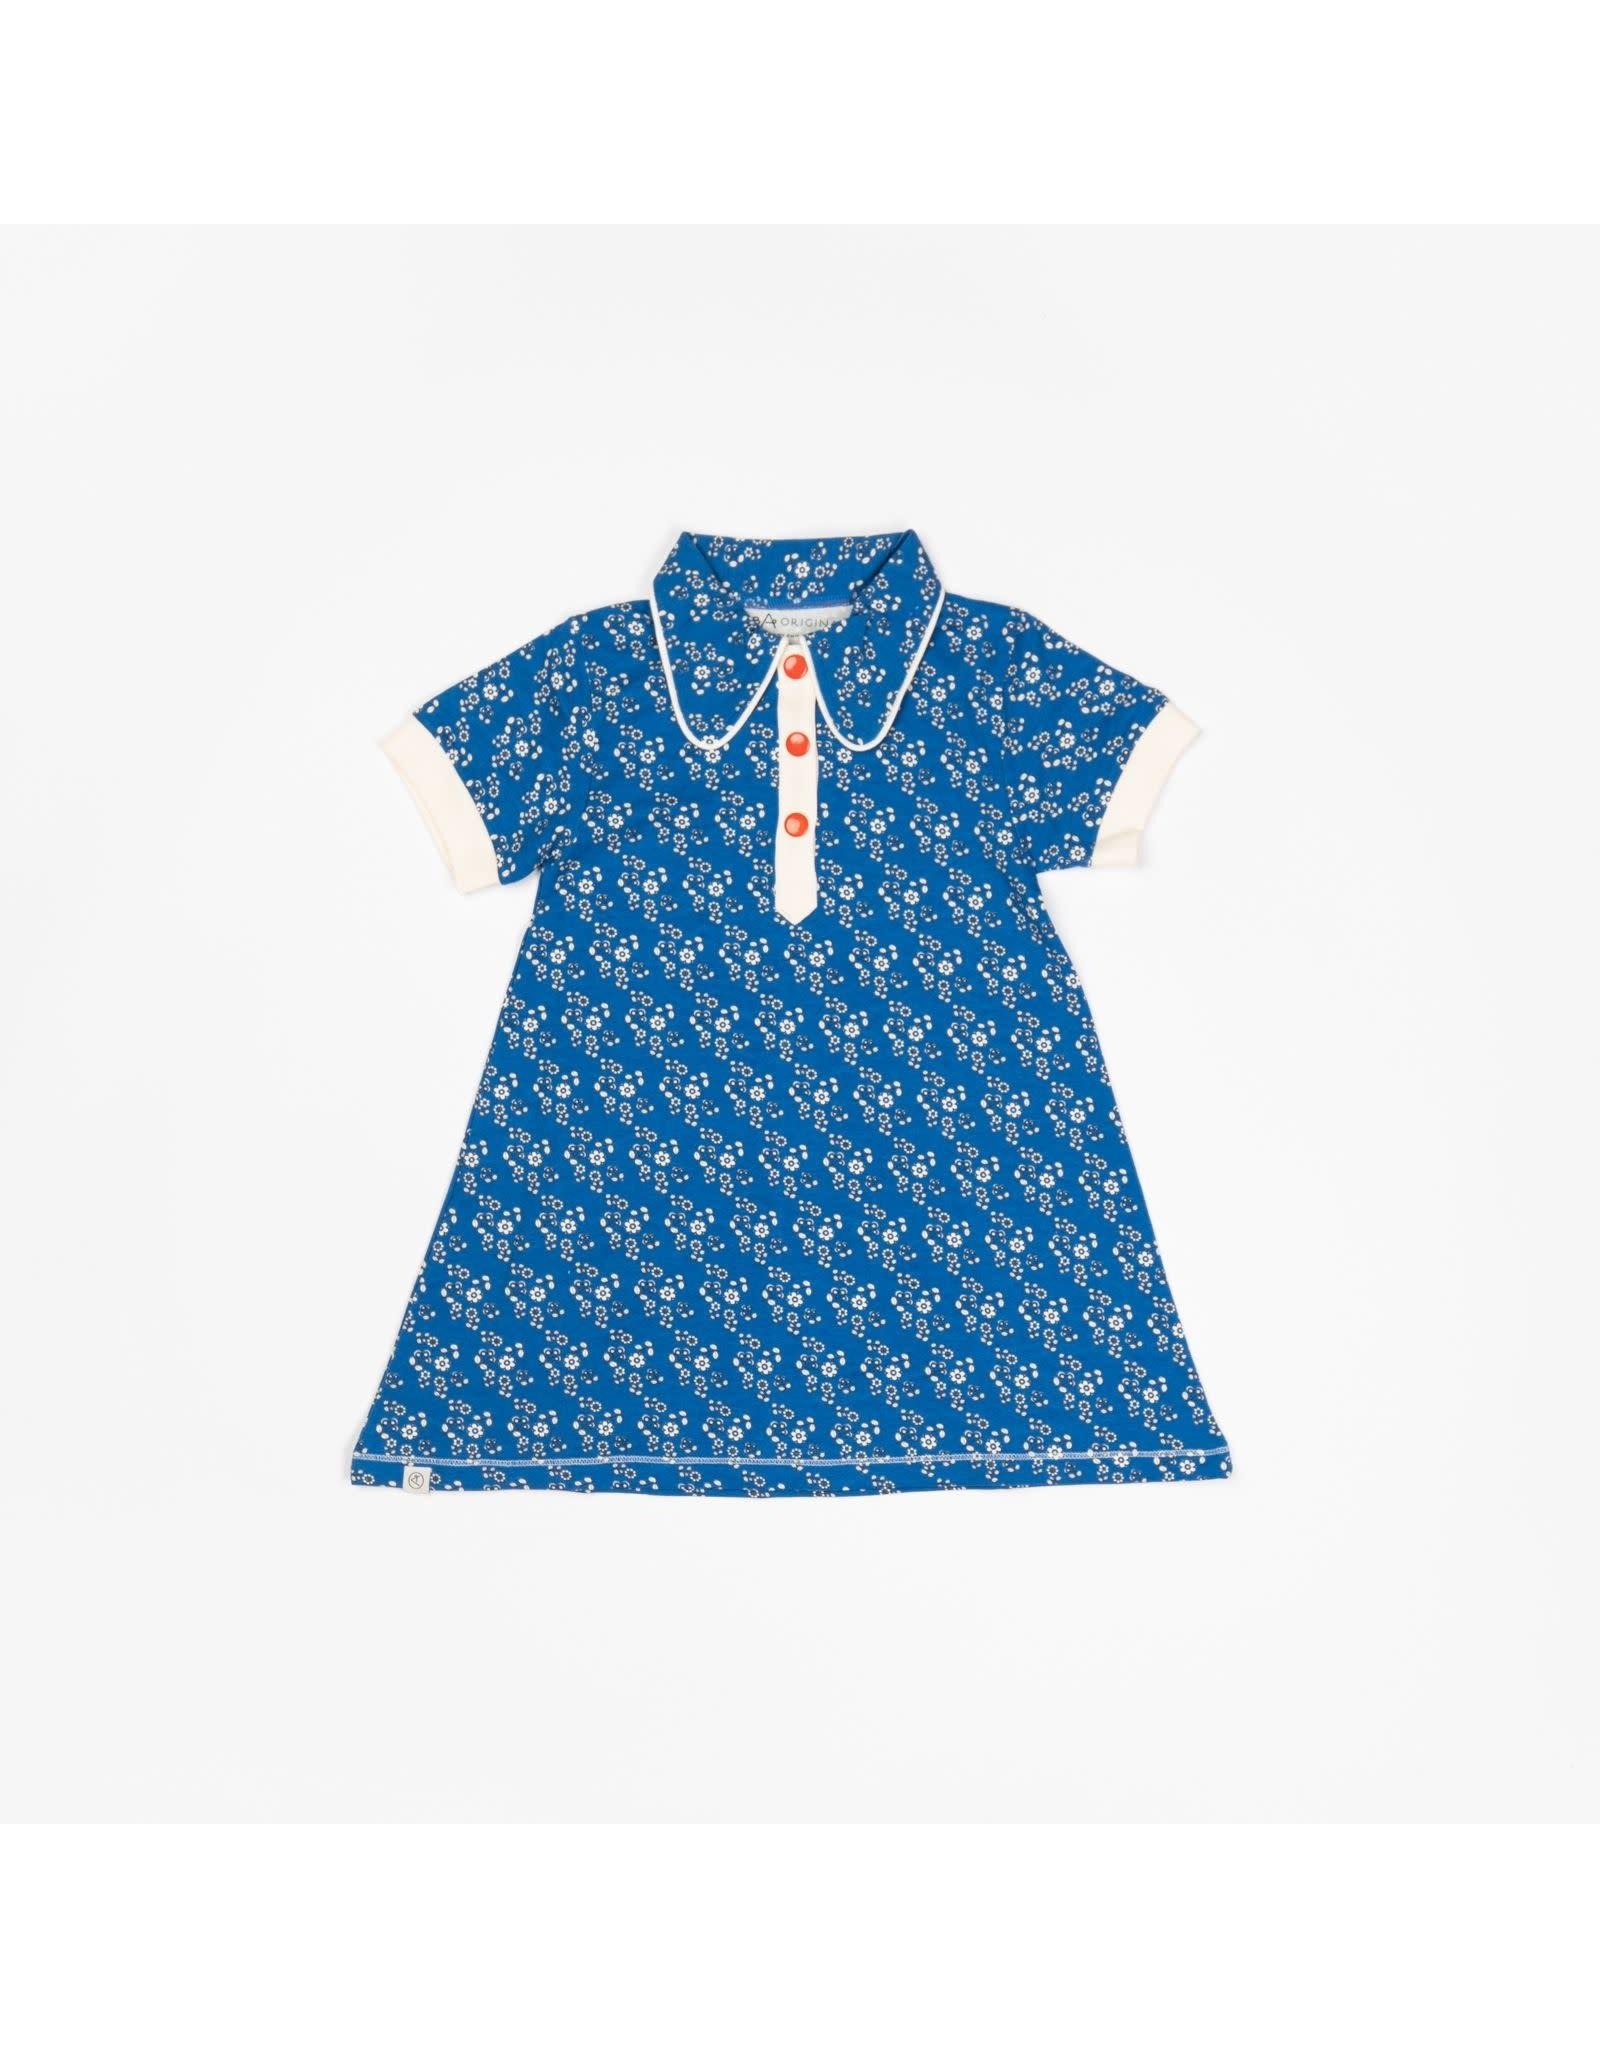 ALBA of Denmark Ultra schattig blauw retro kleedje